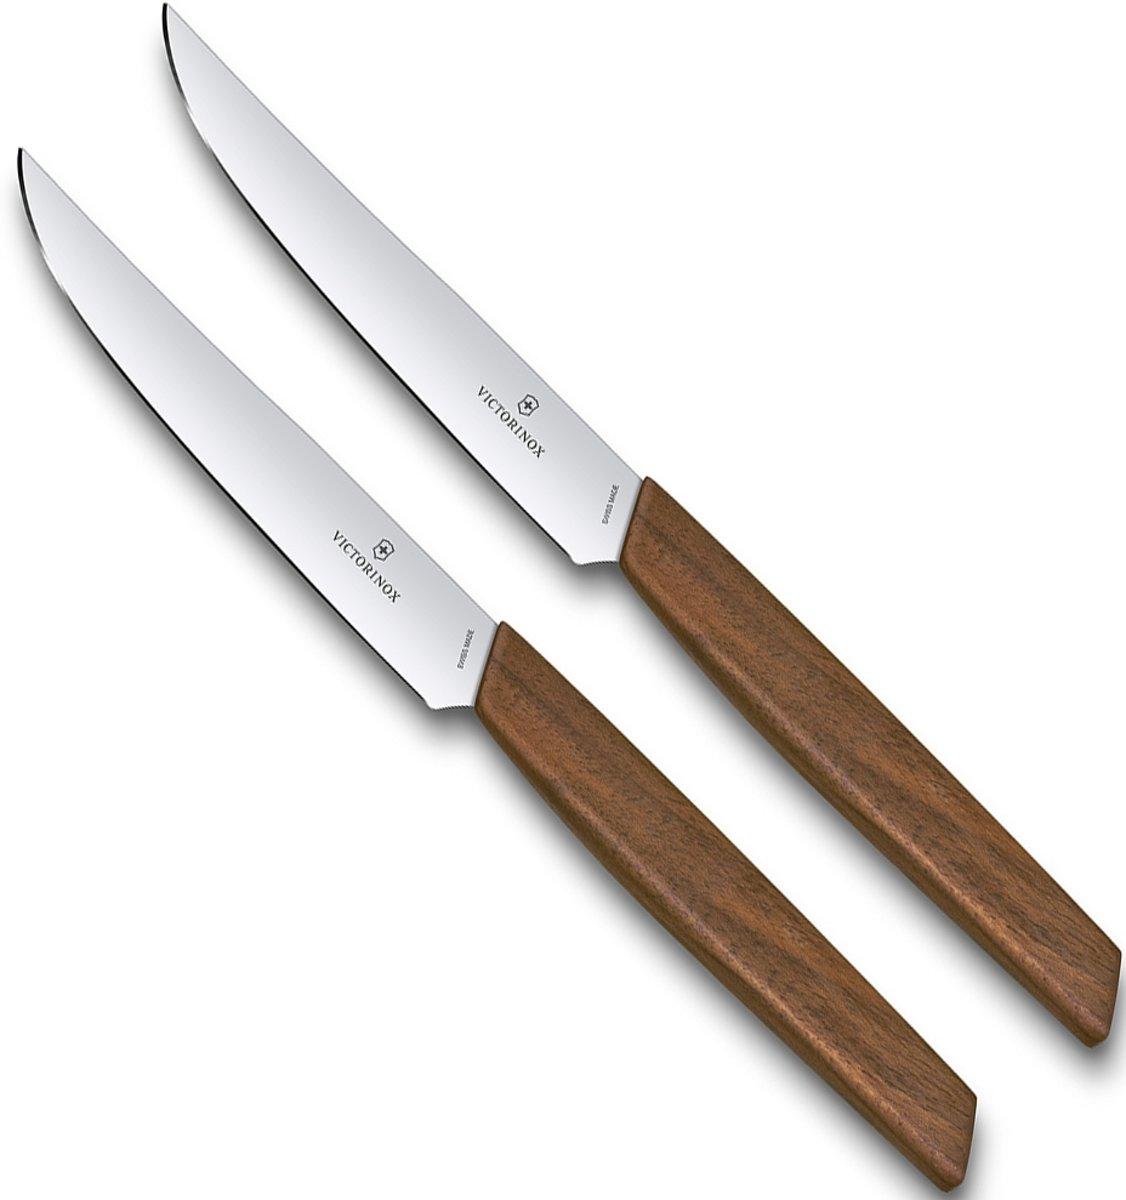 Victorinox Swiss Modern steakmessenset 2-delig kopen